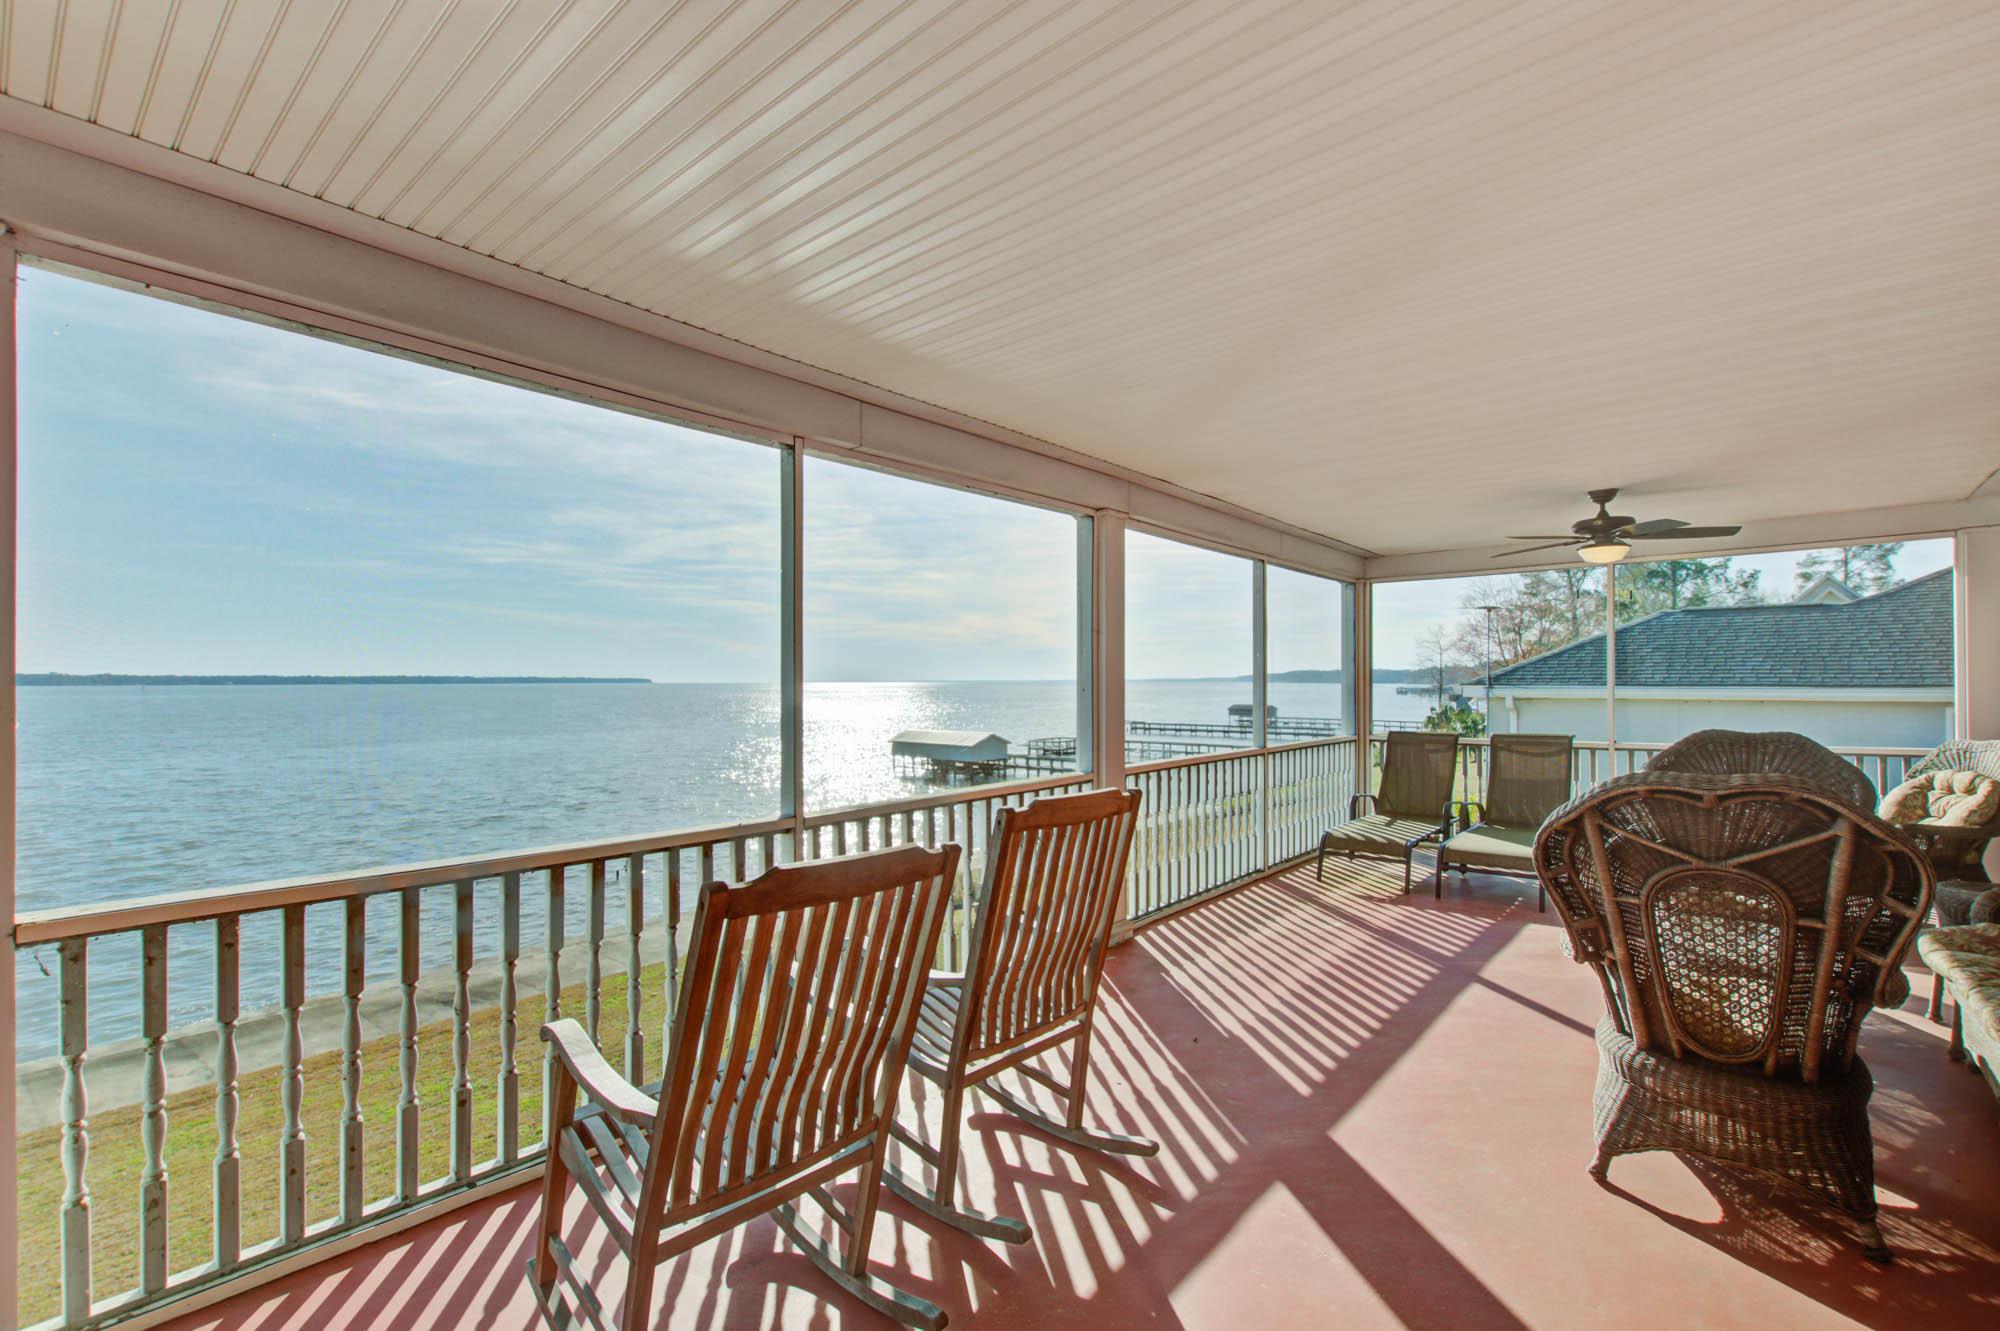 Santee Cooper Resort Homes For Sale - 449 Santee, Santee, SC - 28